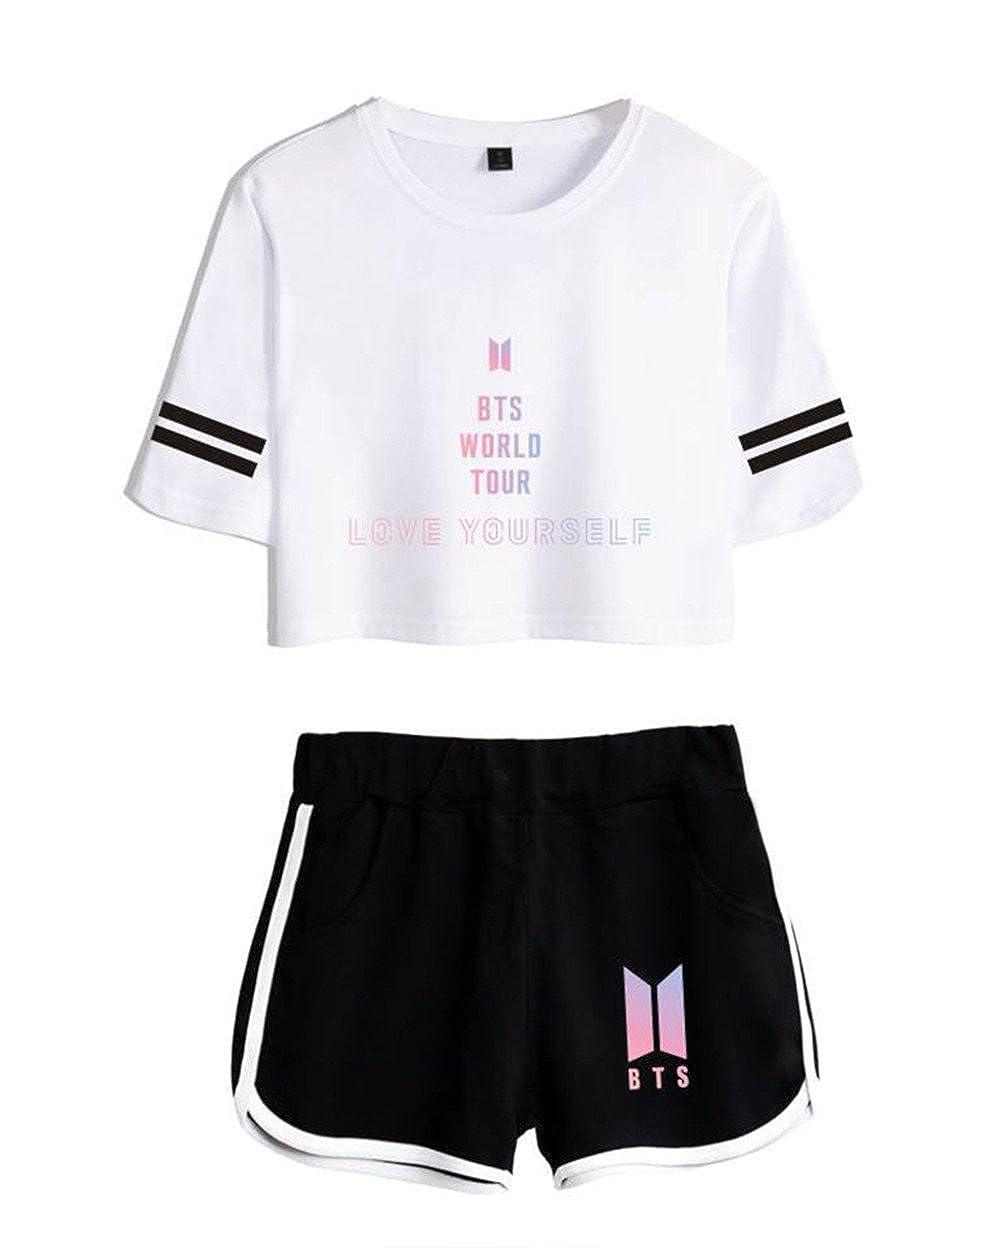 AILIENT Mujer Deportiva KPOP BTS Love Yourself World Tour 2018 2pcs Crop Top y Pantalones Cortos Set para Yoga Fitness Camisetas Verano Cuello Redondo